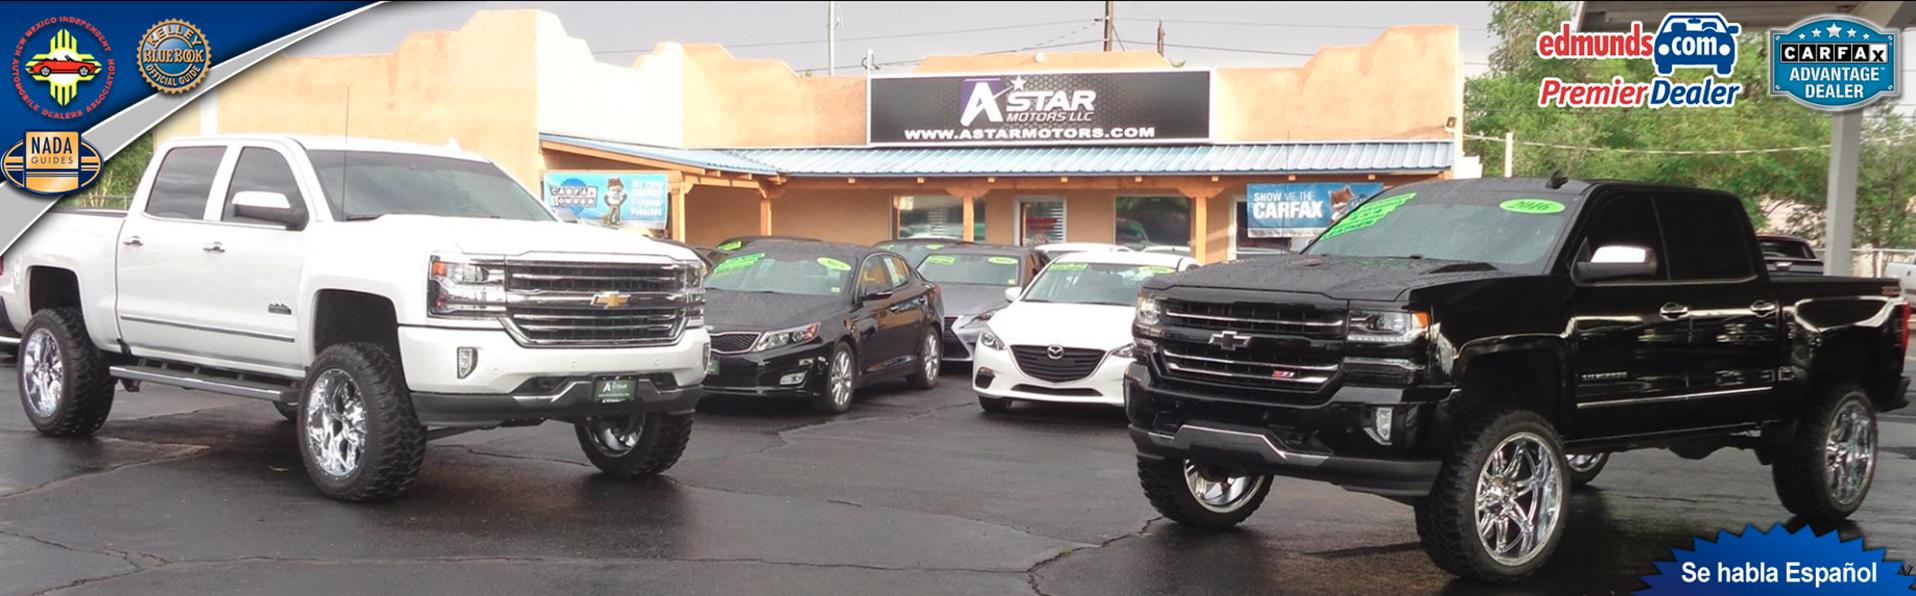 Used Cars In Albuquerque >> Used Cars Albuquerque Nm Used Cars Trucks Nm A Star Motors Llc